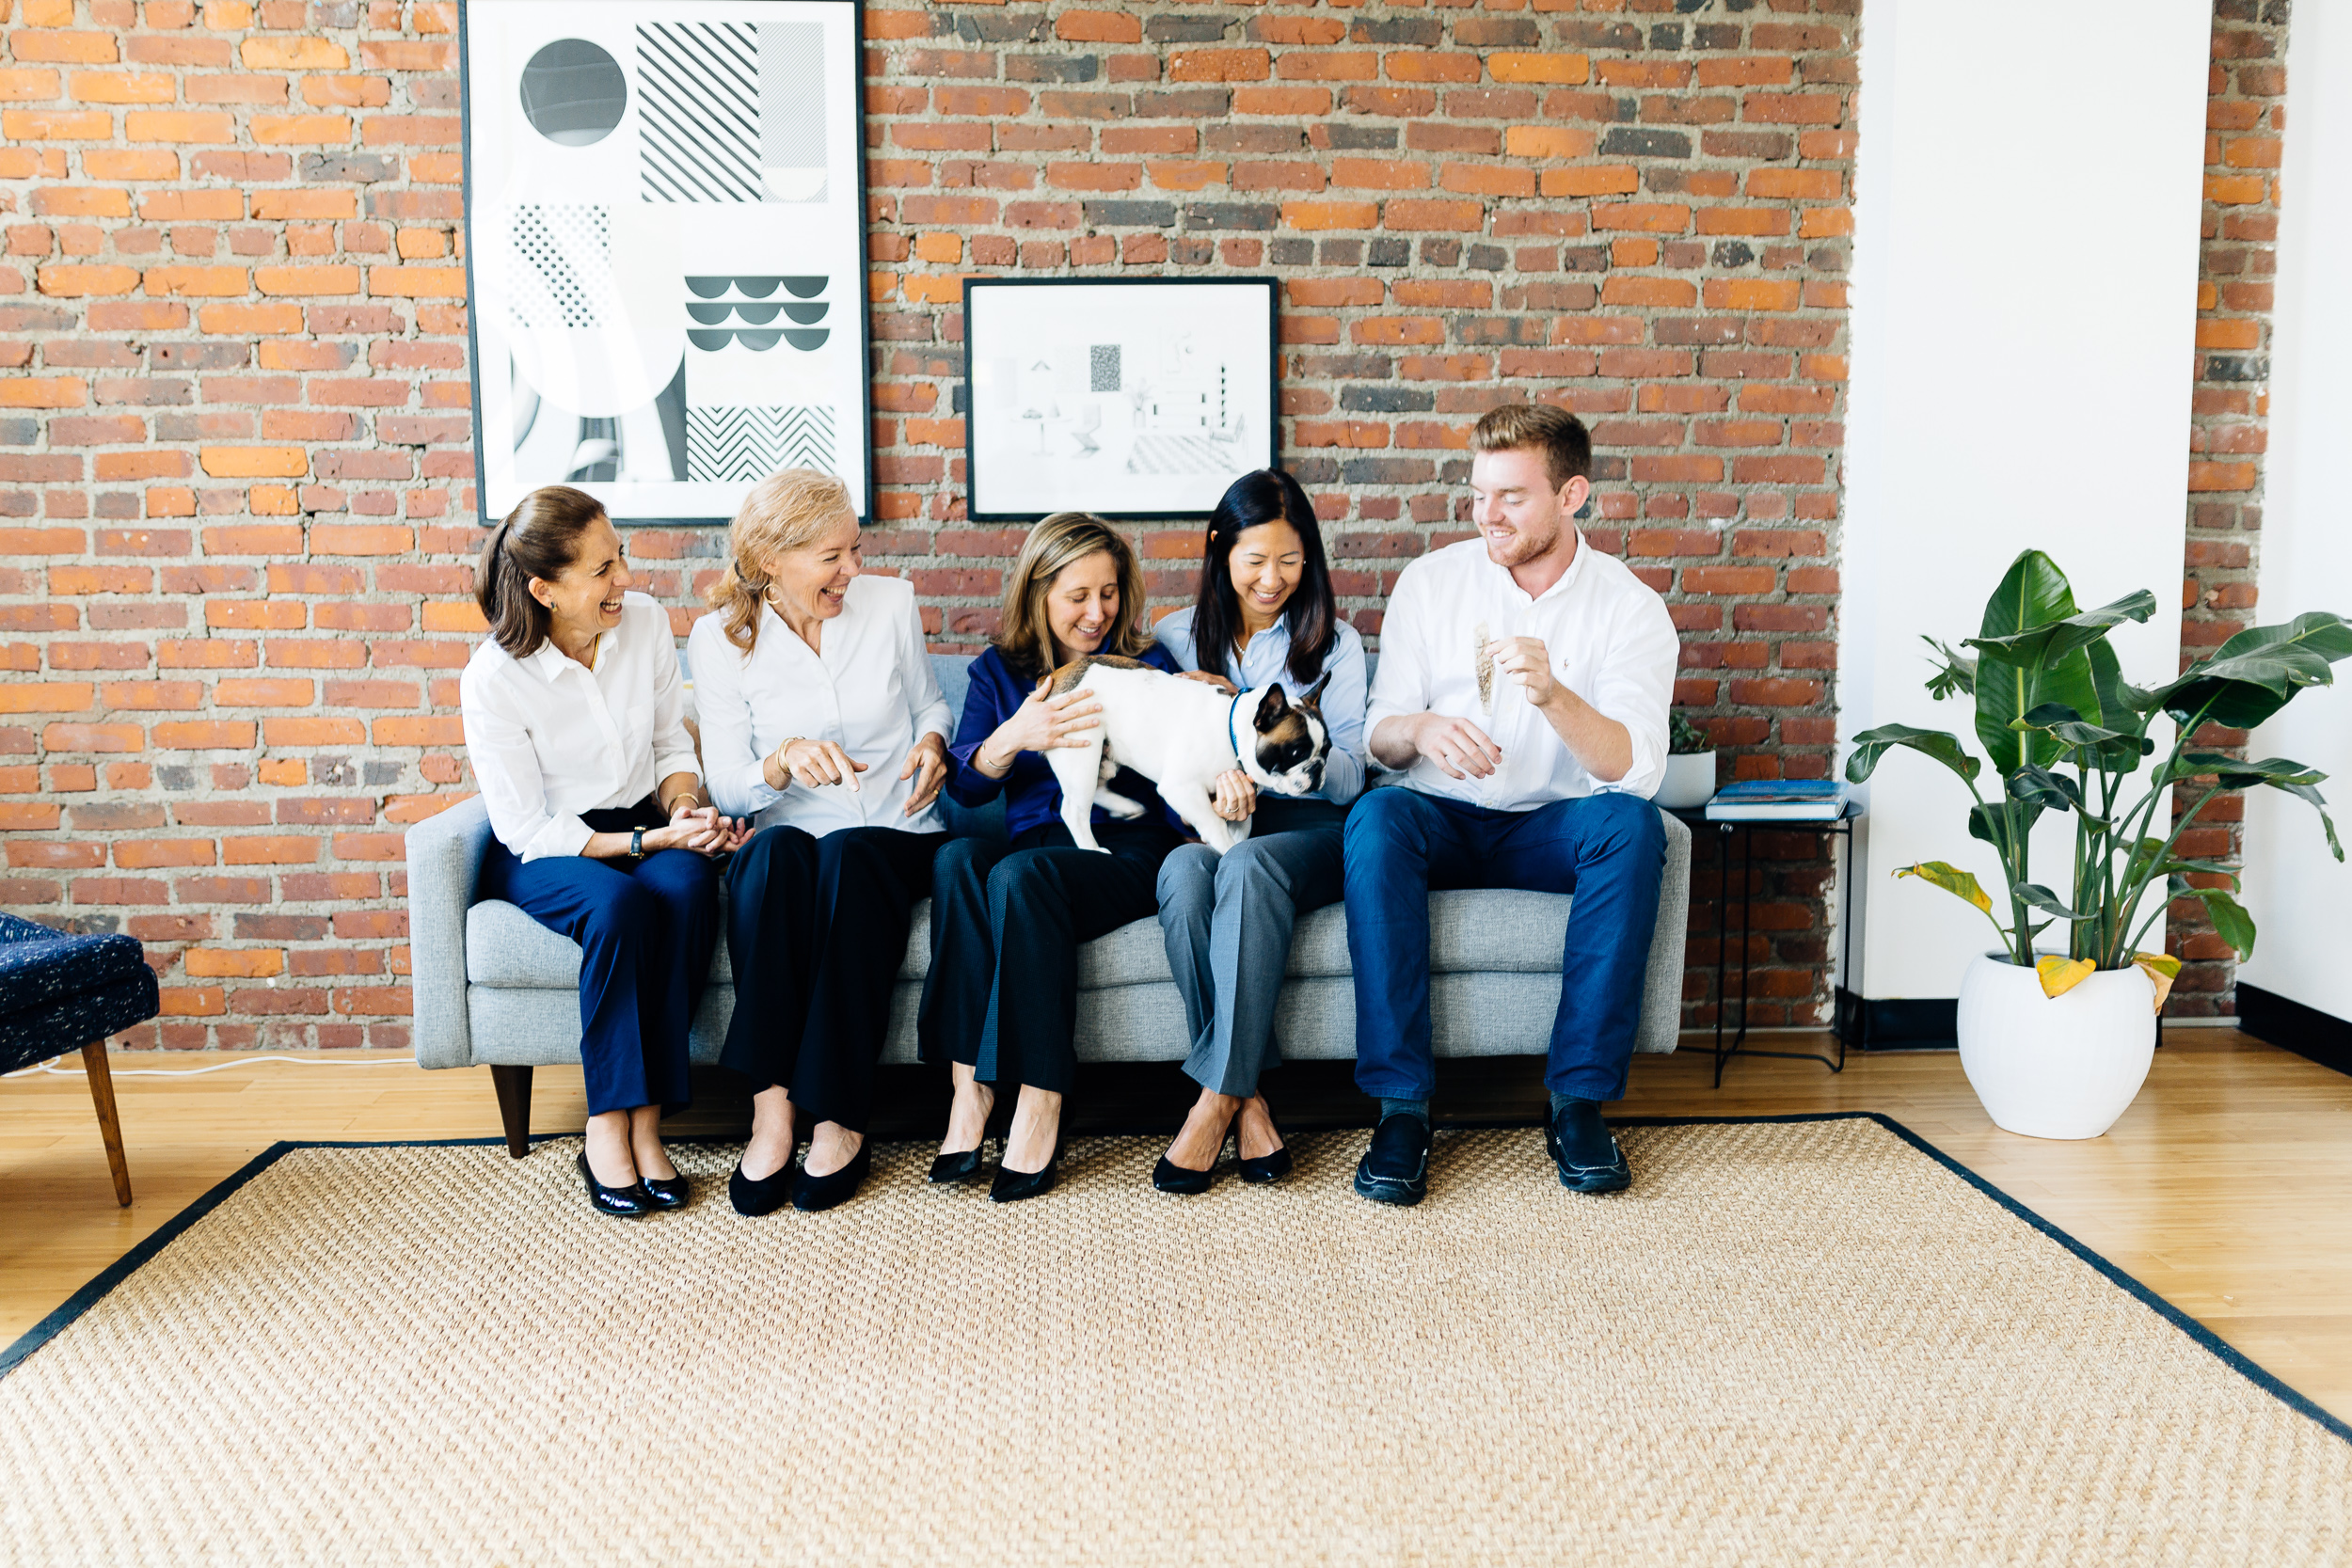 Isabel Saltzman, Susan Dahl, Jessica Grande, Liz Darling, Doug Dahl and Moses of LEVATUS Wealth Services